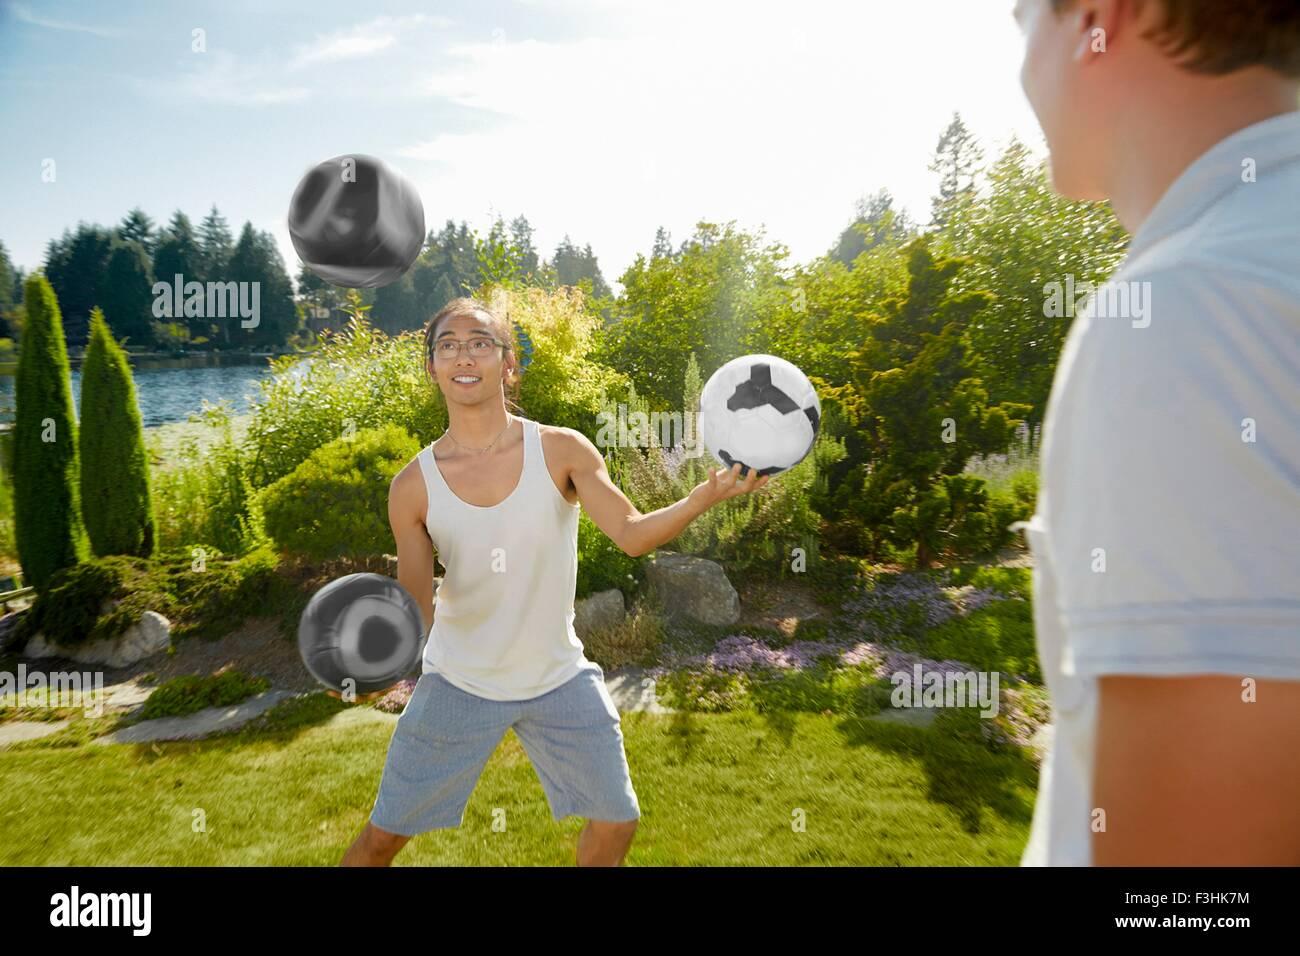 Man juggling balls in field - Stock Image